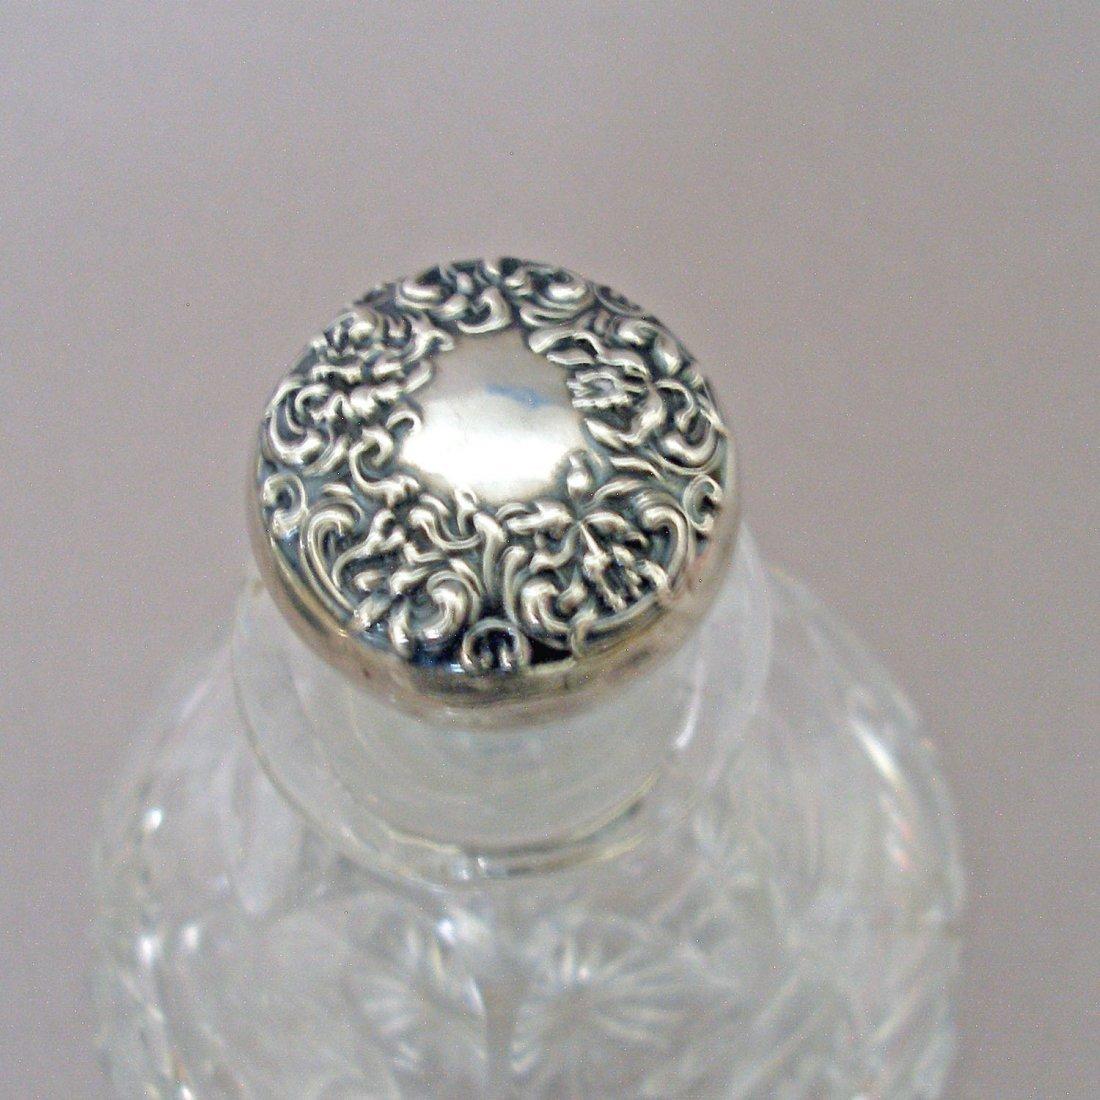 Sterling Lidded Glass Crystal Cologne/Perfume Bottle - 5